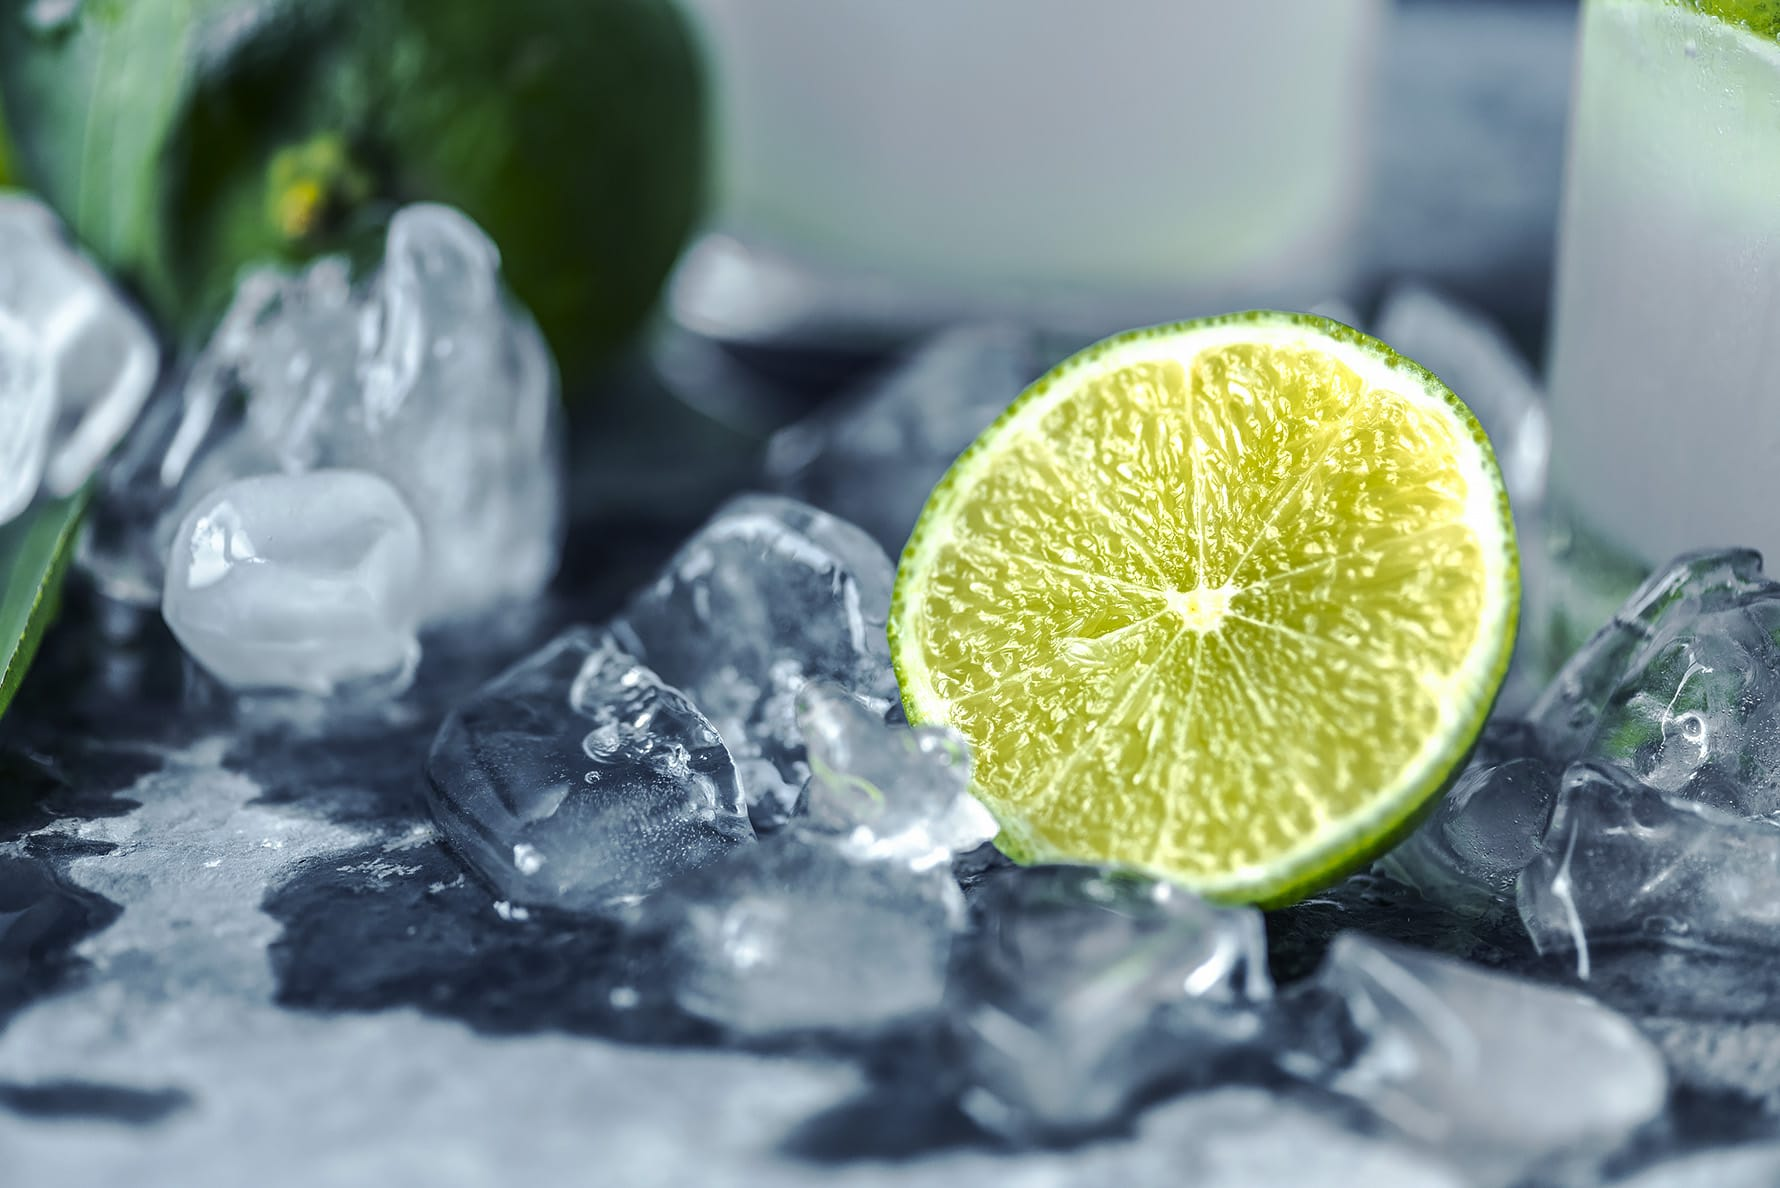 odsvetuje uživanje pijač z ledom